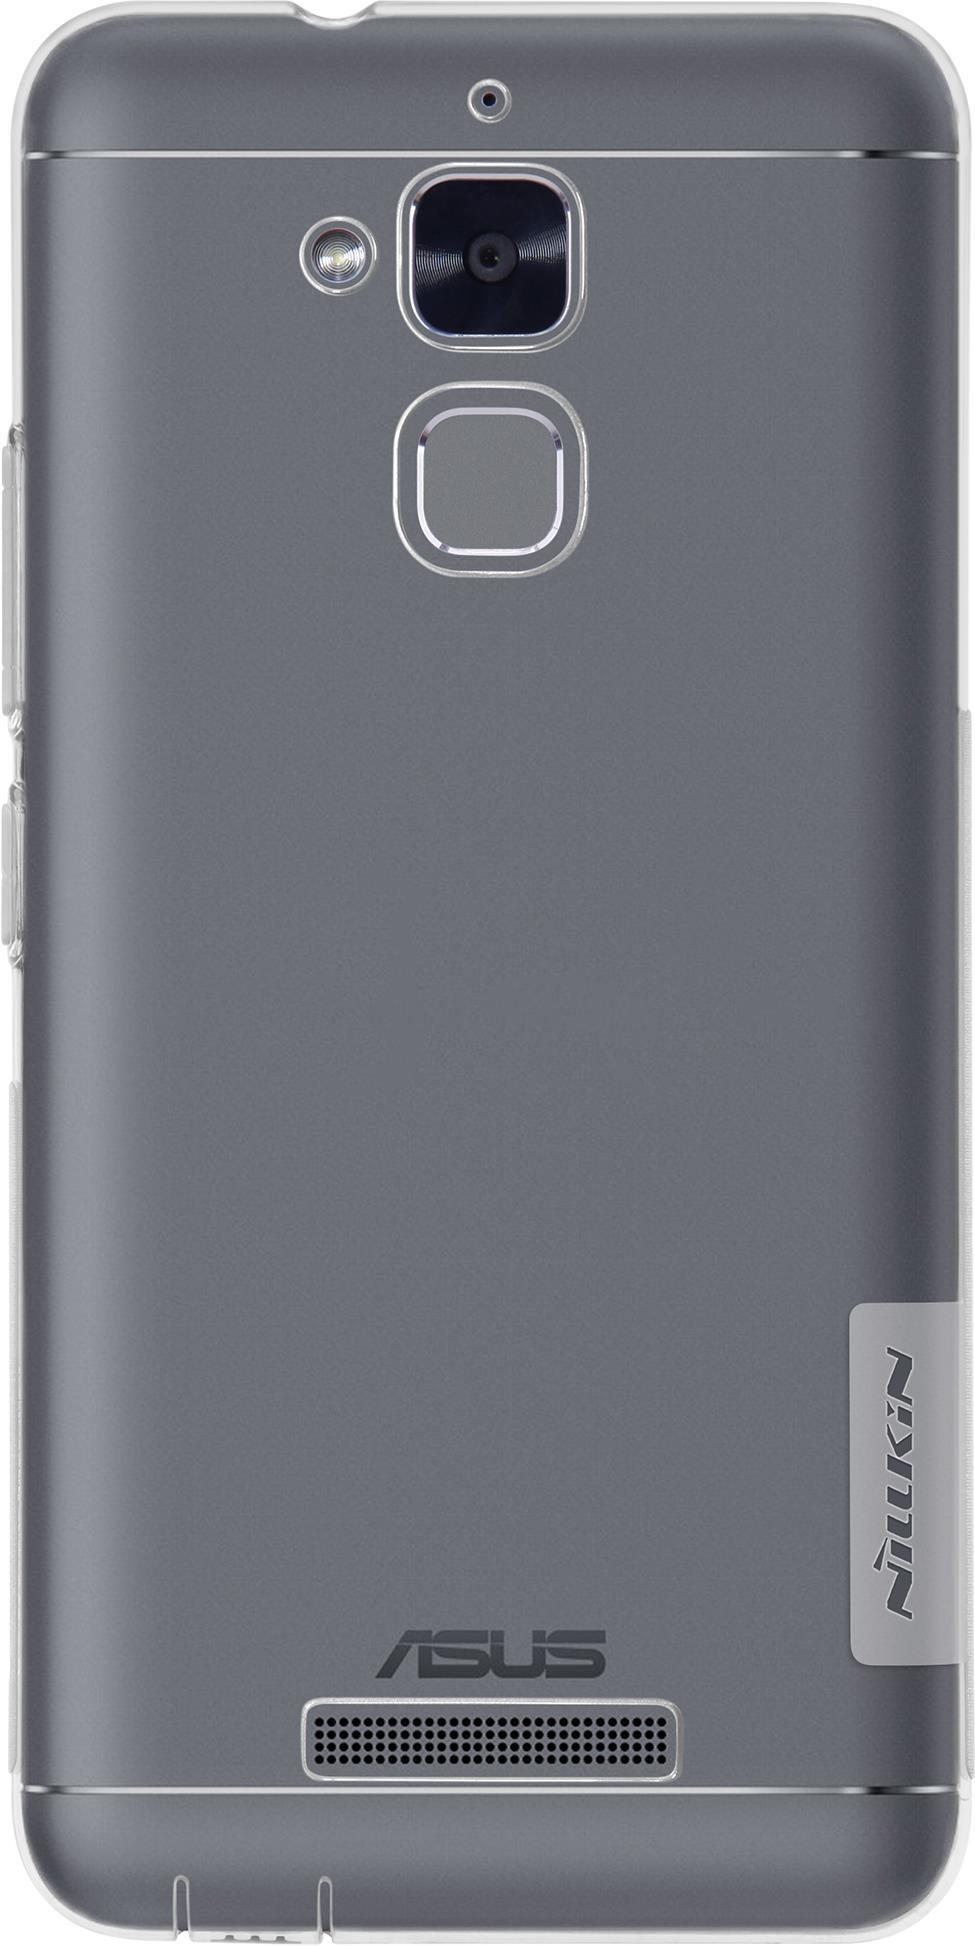 Чехол для сотового телефона Nillkin TPU, 6902048129566, белый nillkin nature tpu case чехол для iphone 6 plus